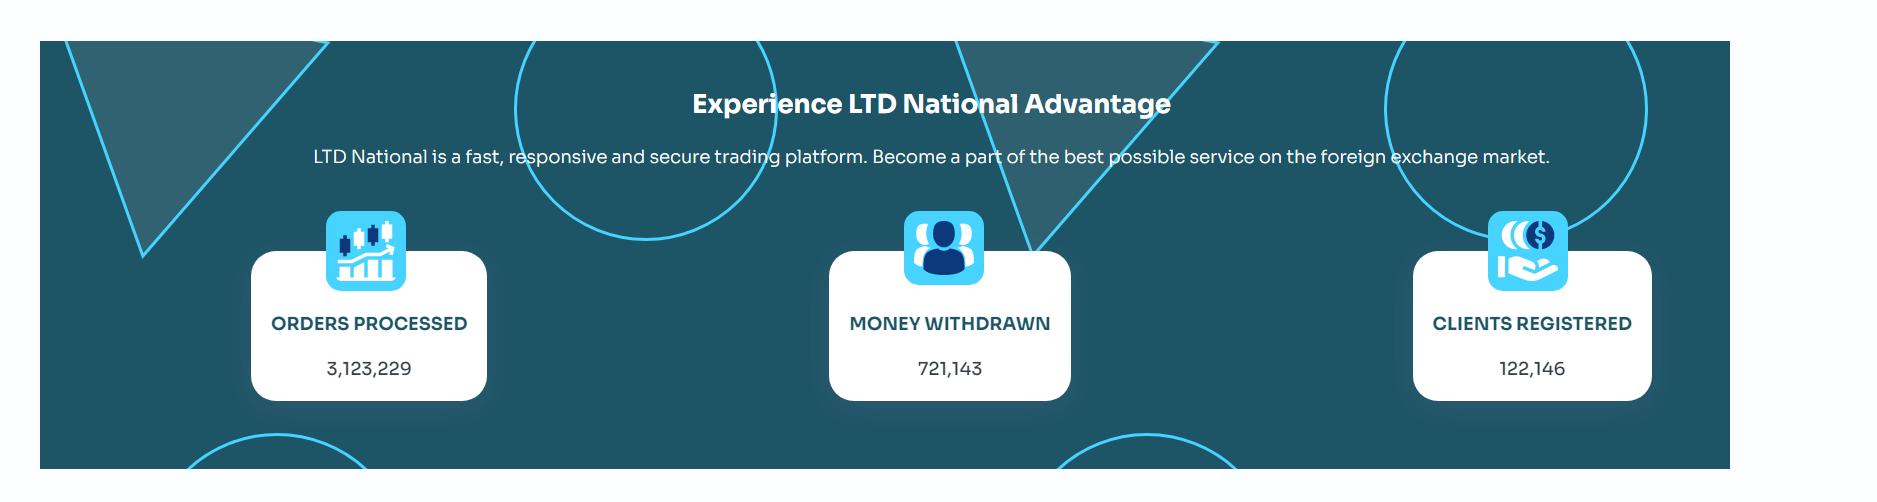 Главная страница LTD National